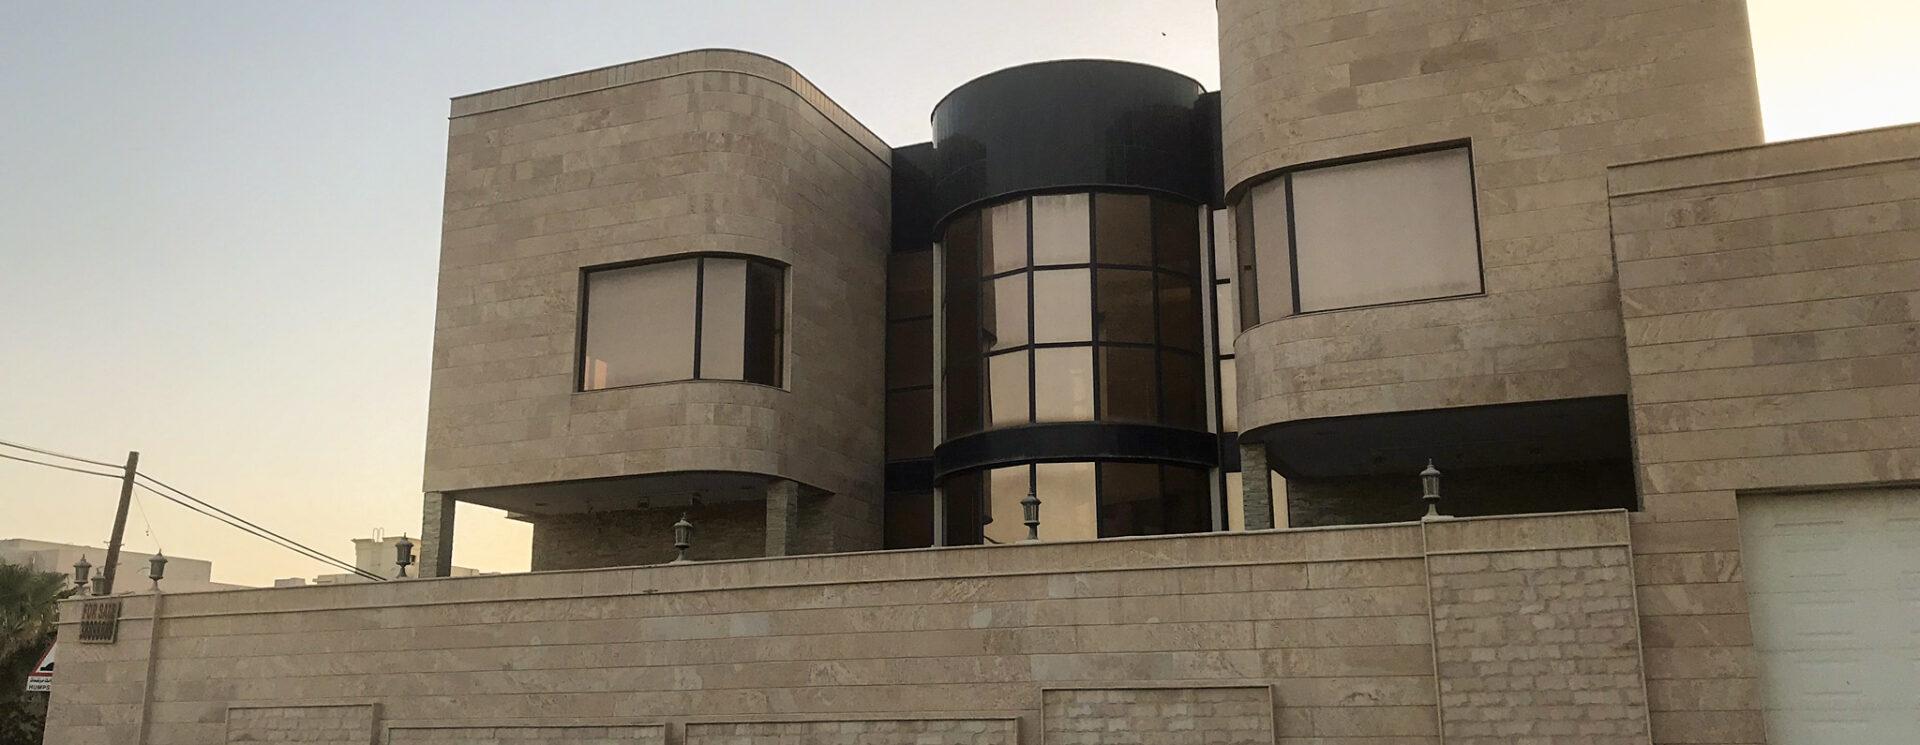 Luxury villa for sale located in Bani Jamra